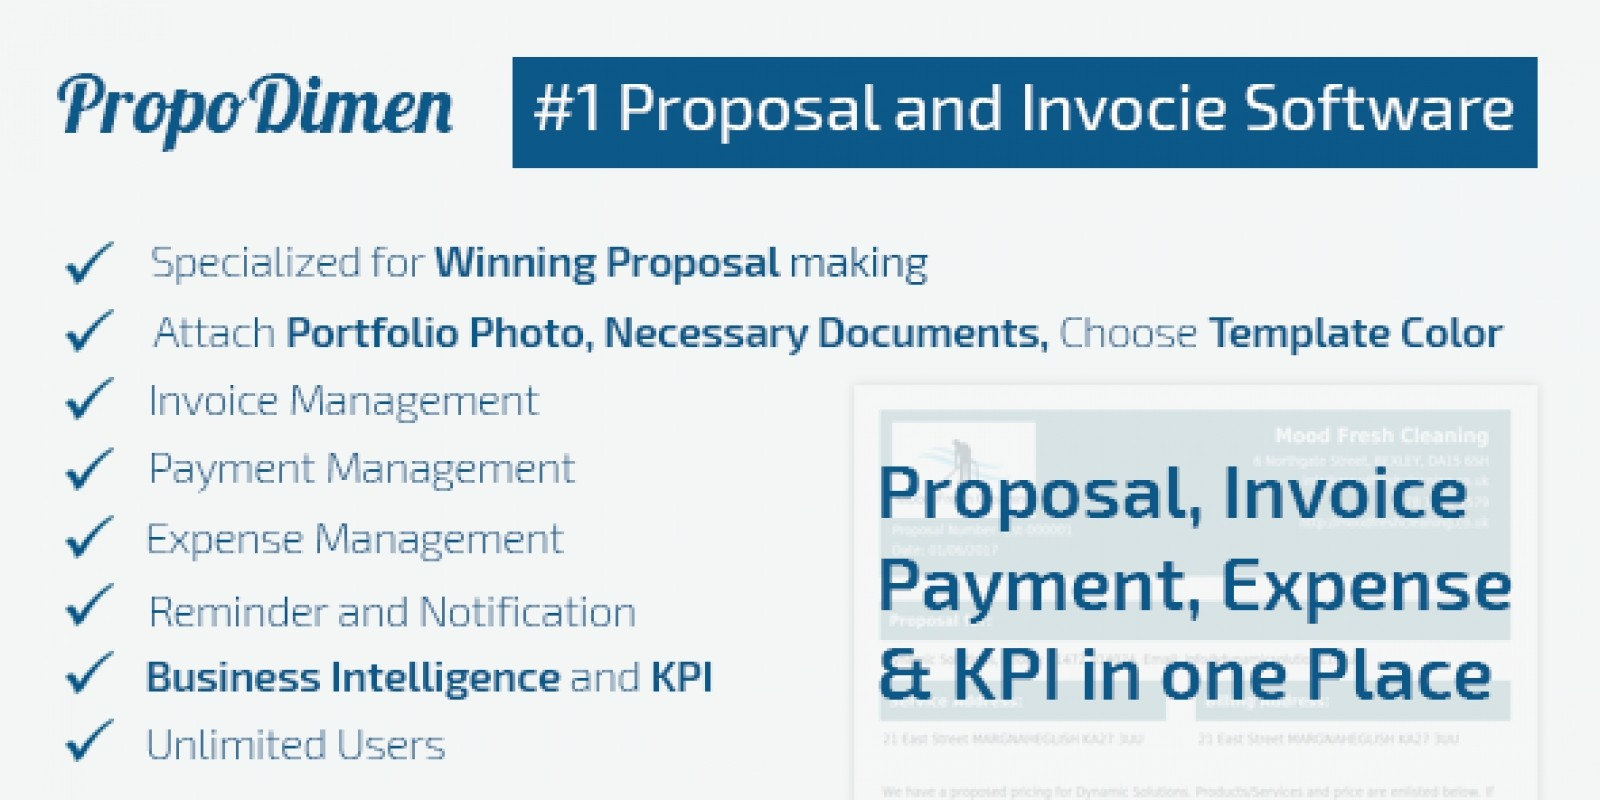 Propodimen - Proposal Invoicing Php Script .